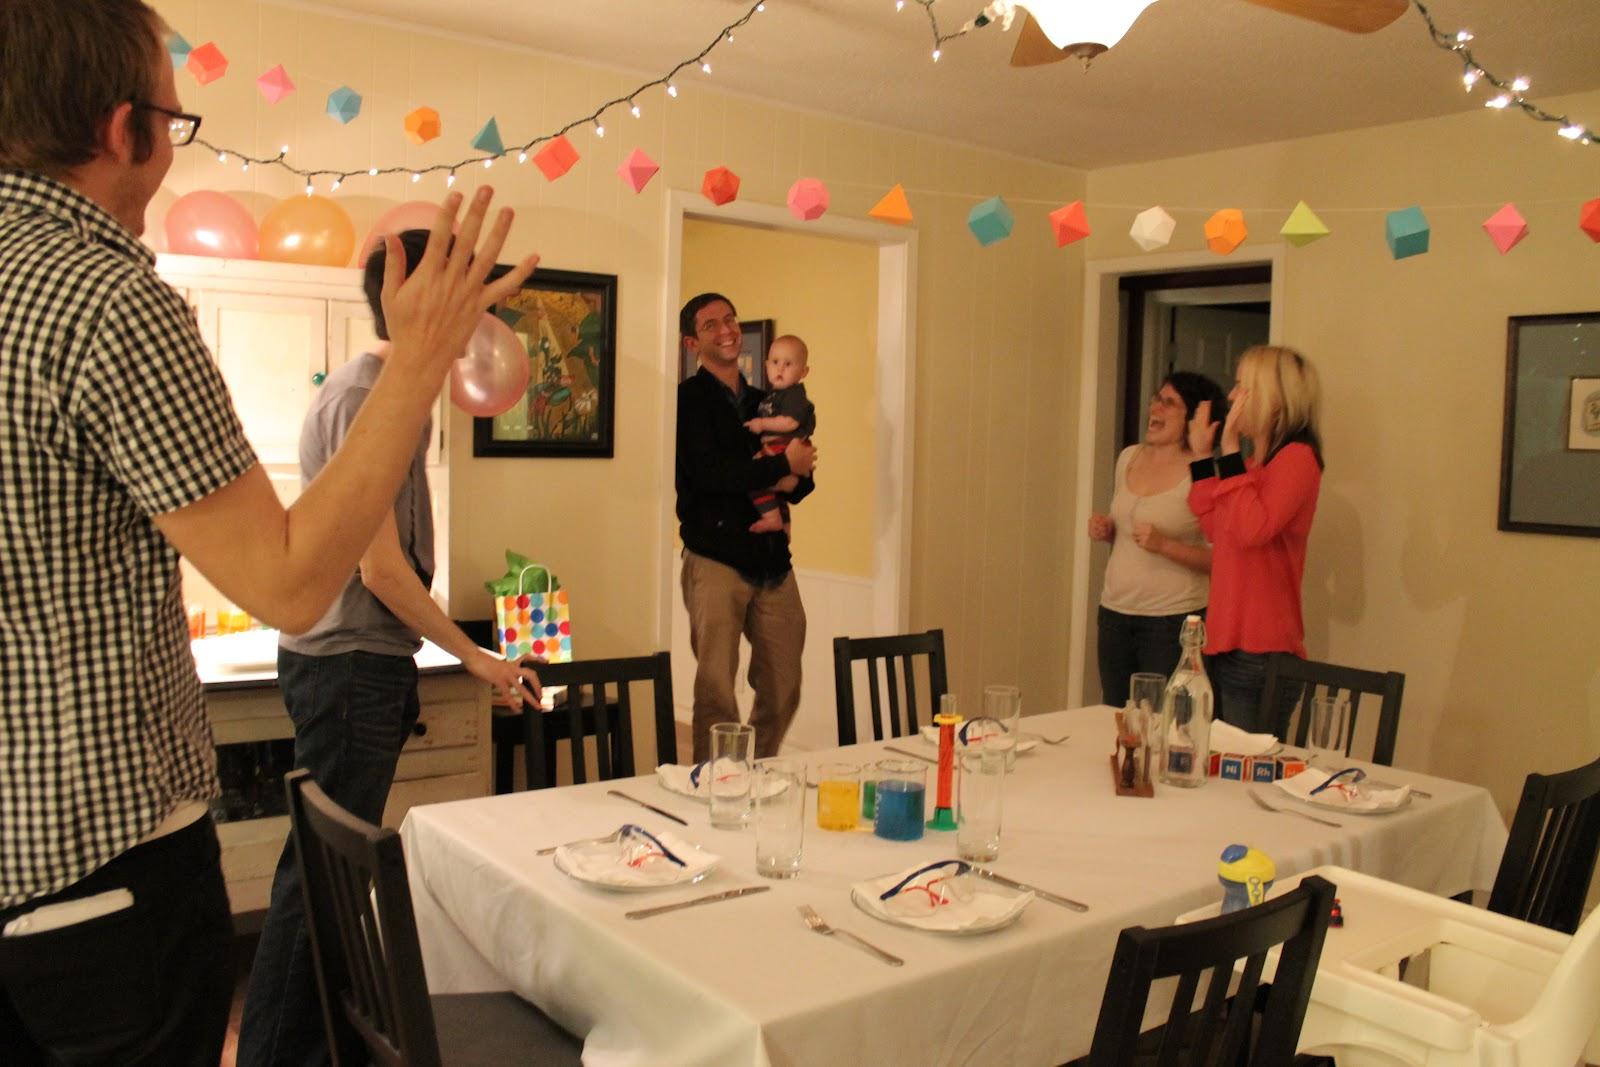 Dustin S Molecular Gastronomy Birthday Party